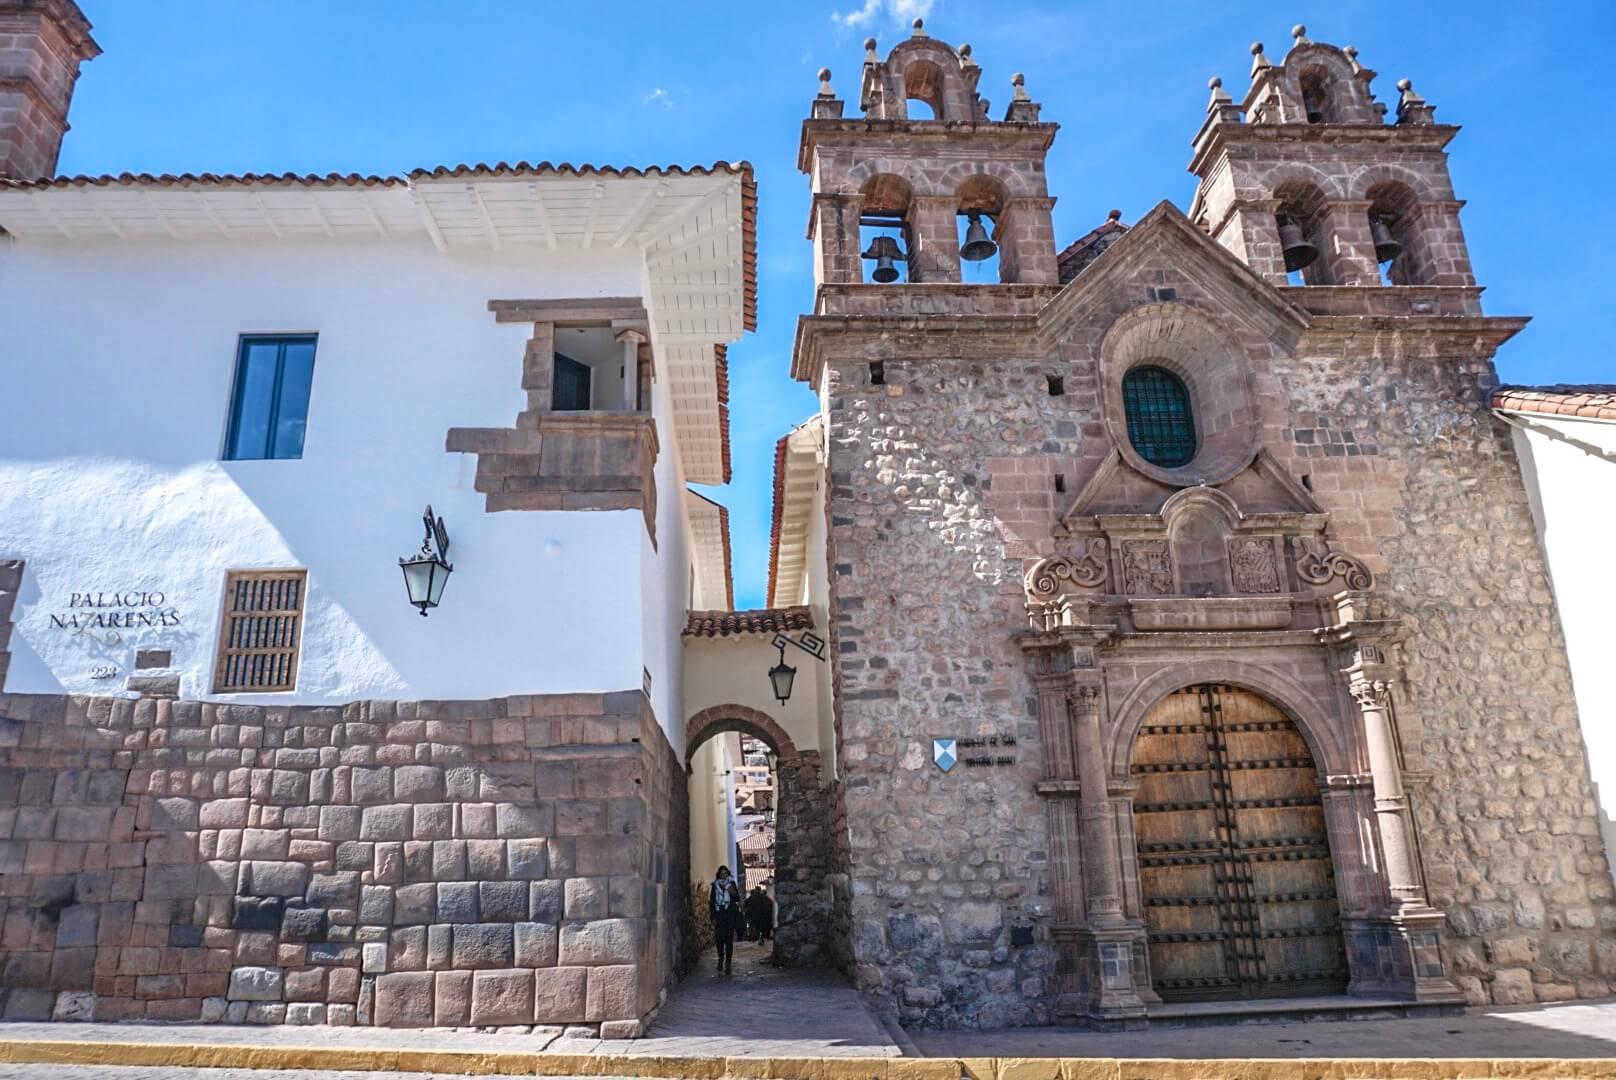 cusco ville inca pérou voyage